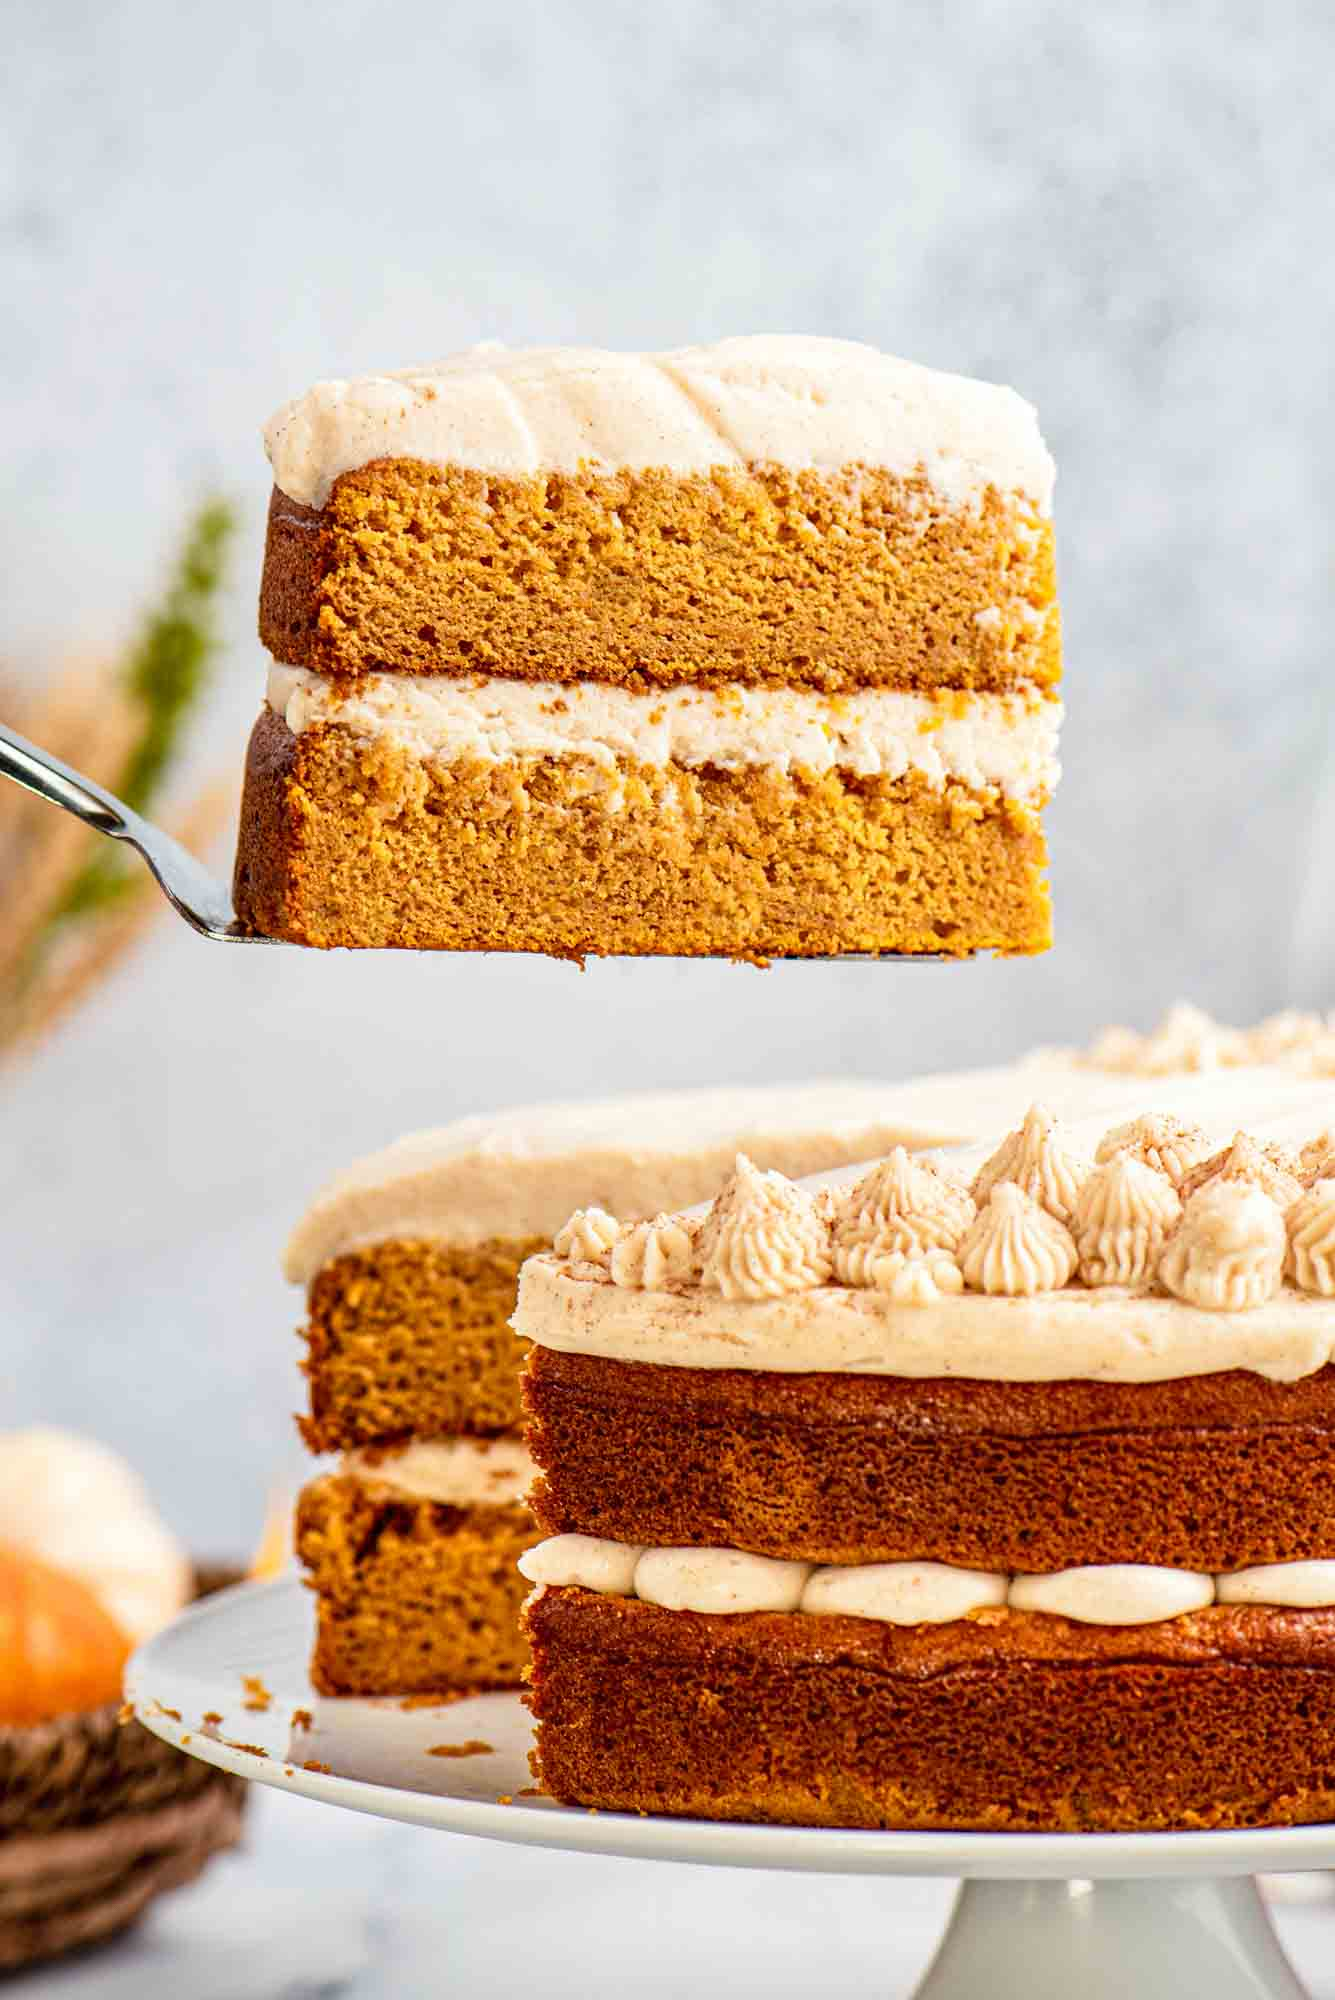 Taking a slice of pumpkin cake